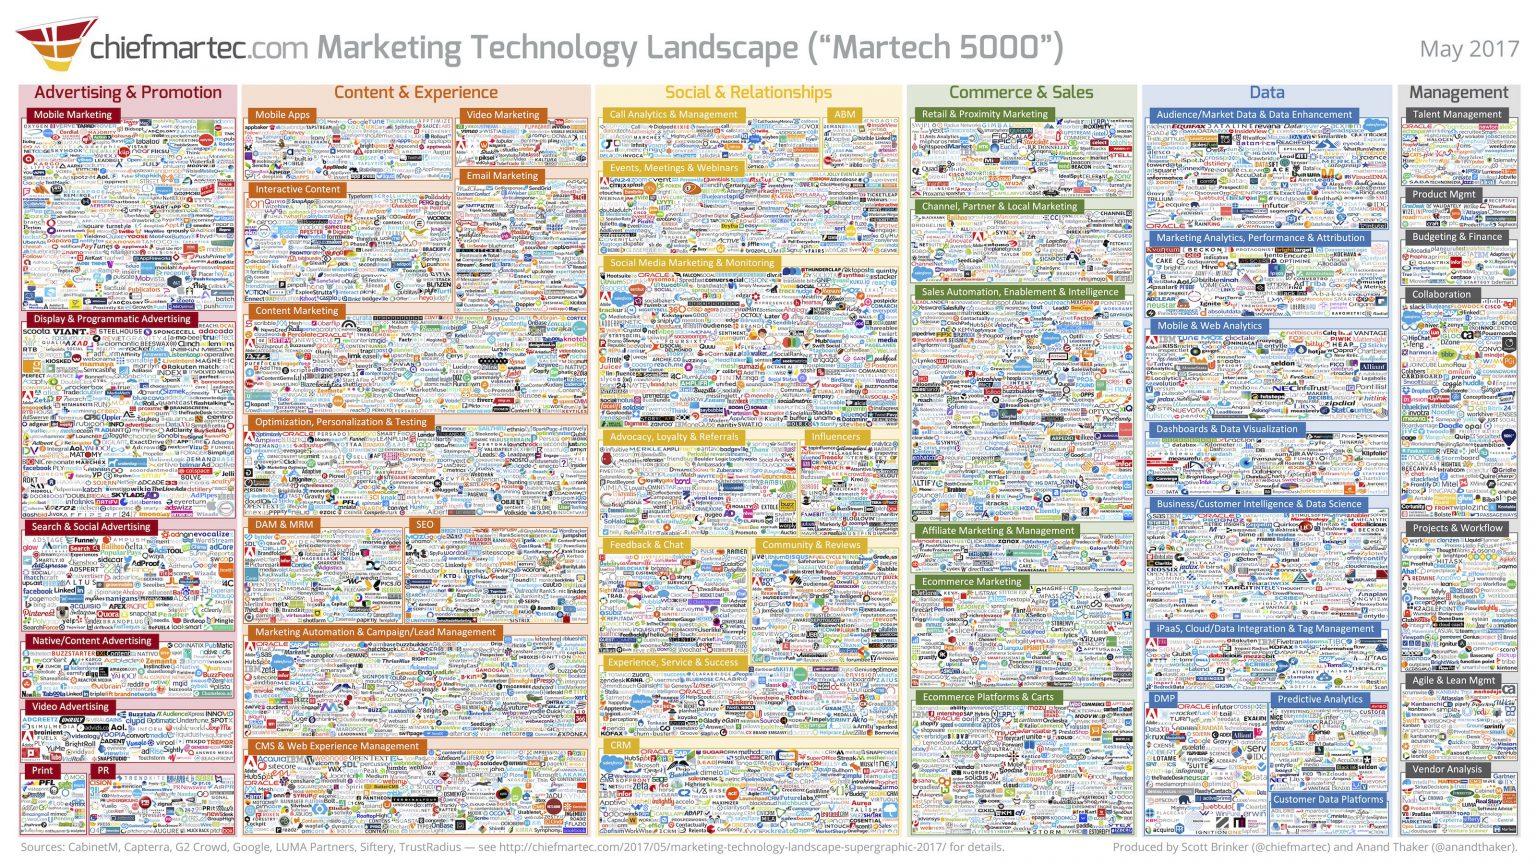 The 2017 digital marketing technology landscape